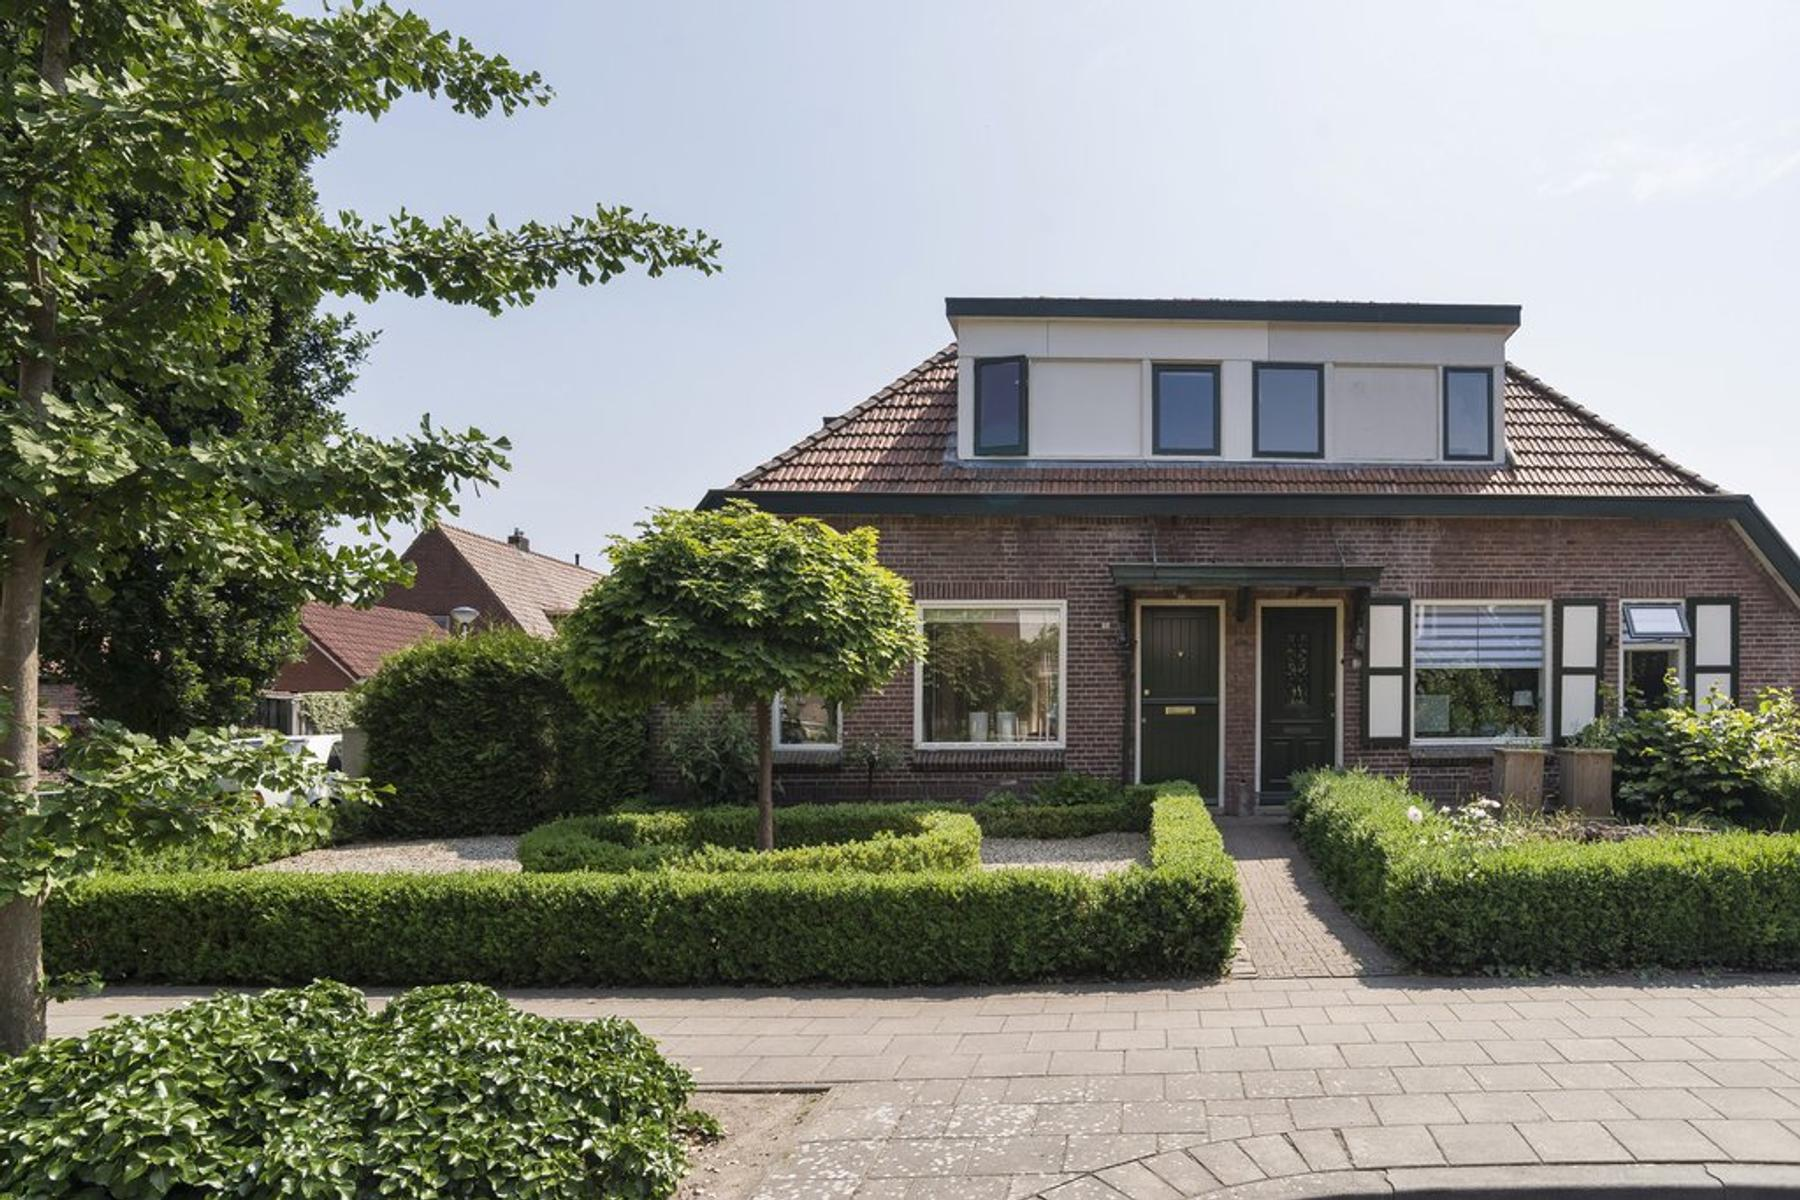 Van Limburg Stirumstraat 32 in Nijverdal 7443 CH